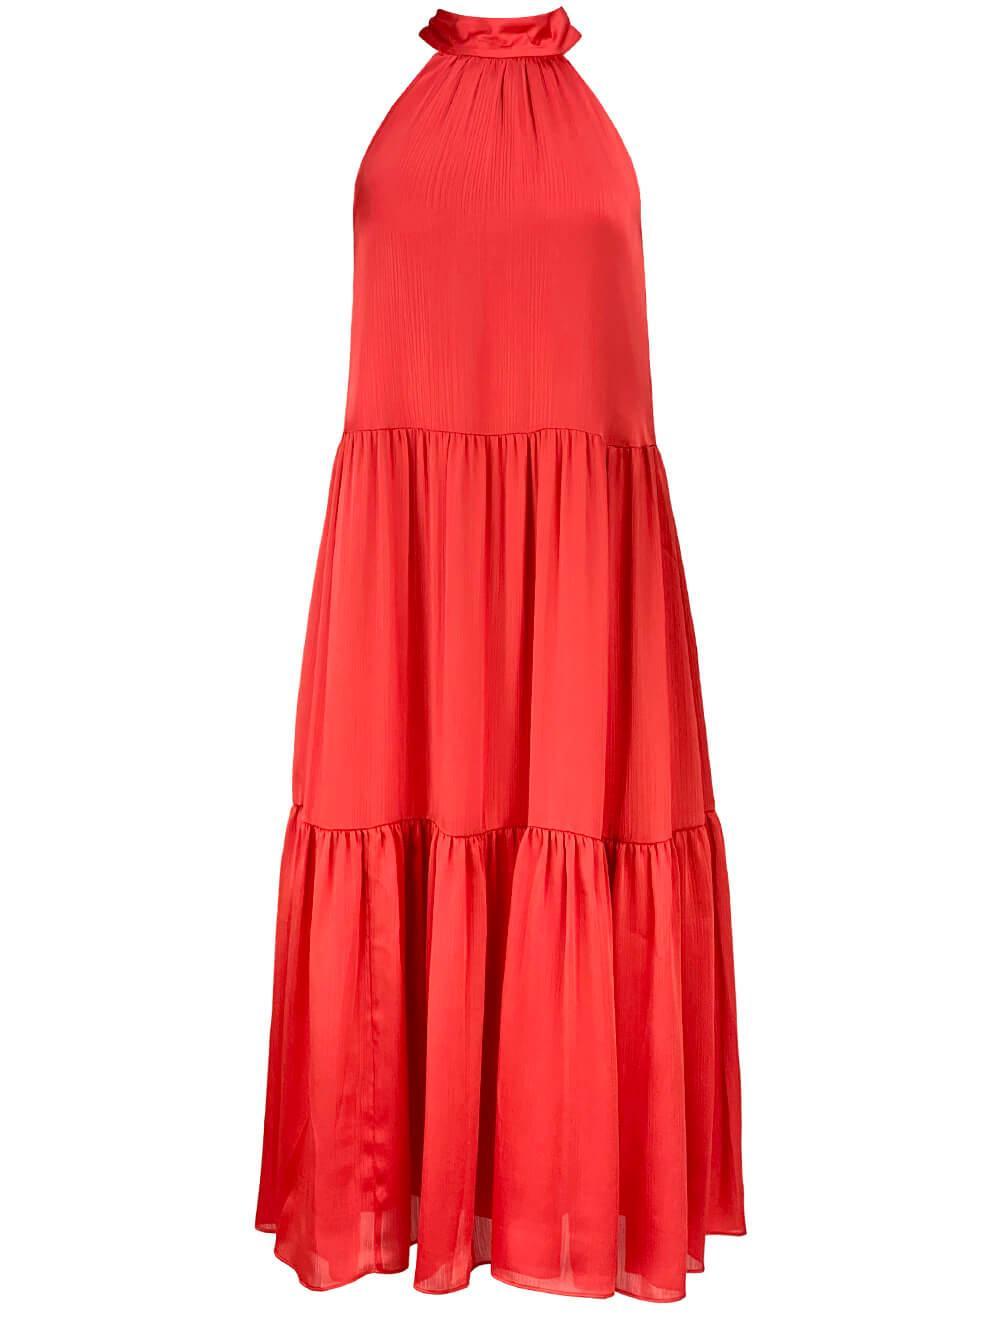 Immeasurable Dress Item # 2105323GG1